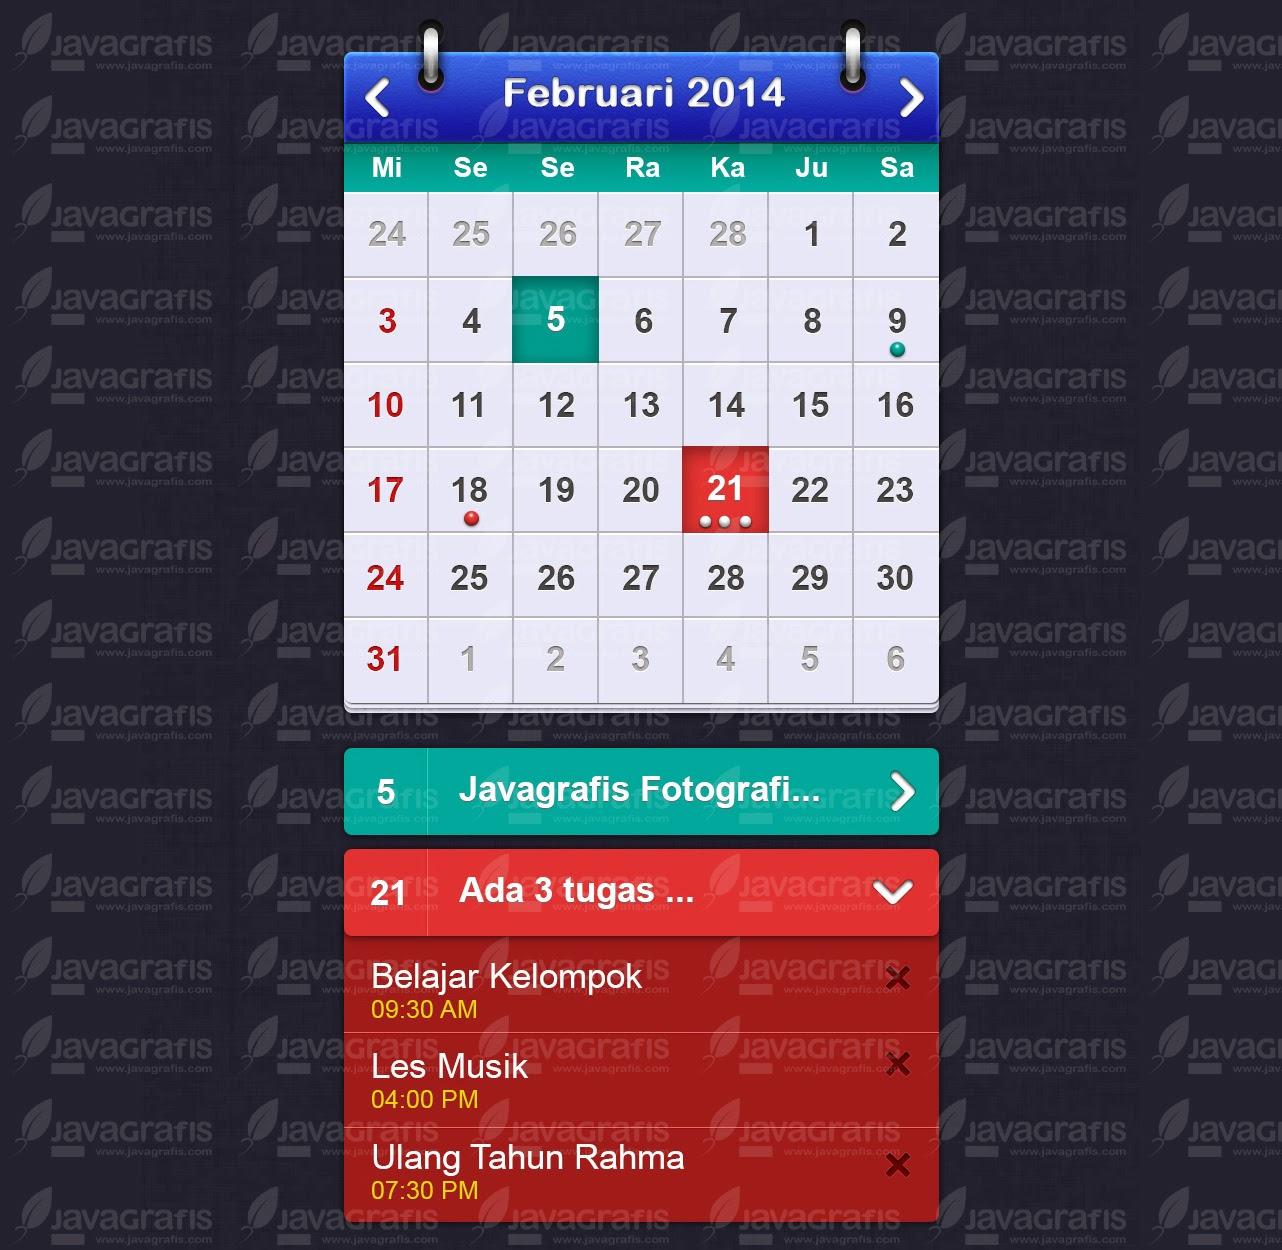 cara membuat kalender dengan Photoshop... cara membuat kalender dengan CorelDraw... Cara Mudah Membuat tanggalan dengan photoshop... Cara Mudah Membuat tanggalan dengan CorelDraw... Download file .psd .cdr tanggalan/Kalender... mengedit tanggalan 2014... file kalender 2015.. template tanggalan/ Kalender 2014... free download kalender 2015